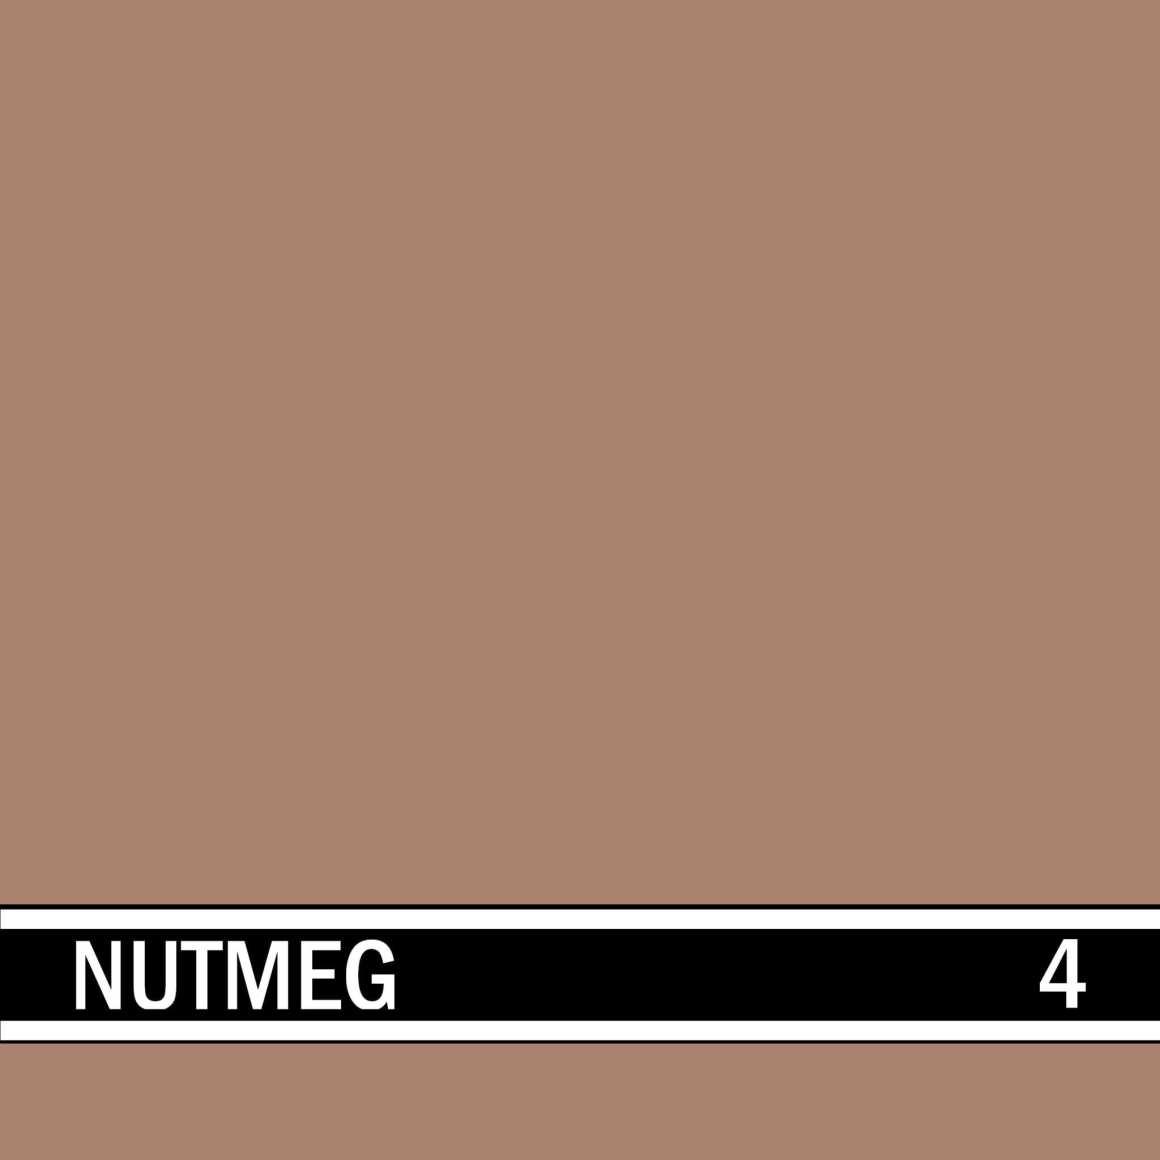 Nutmeg integral concrete color for stamped concrete and decorative colored concrete